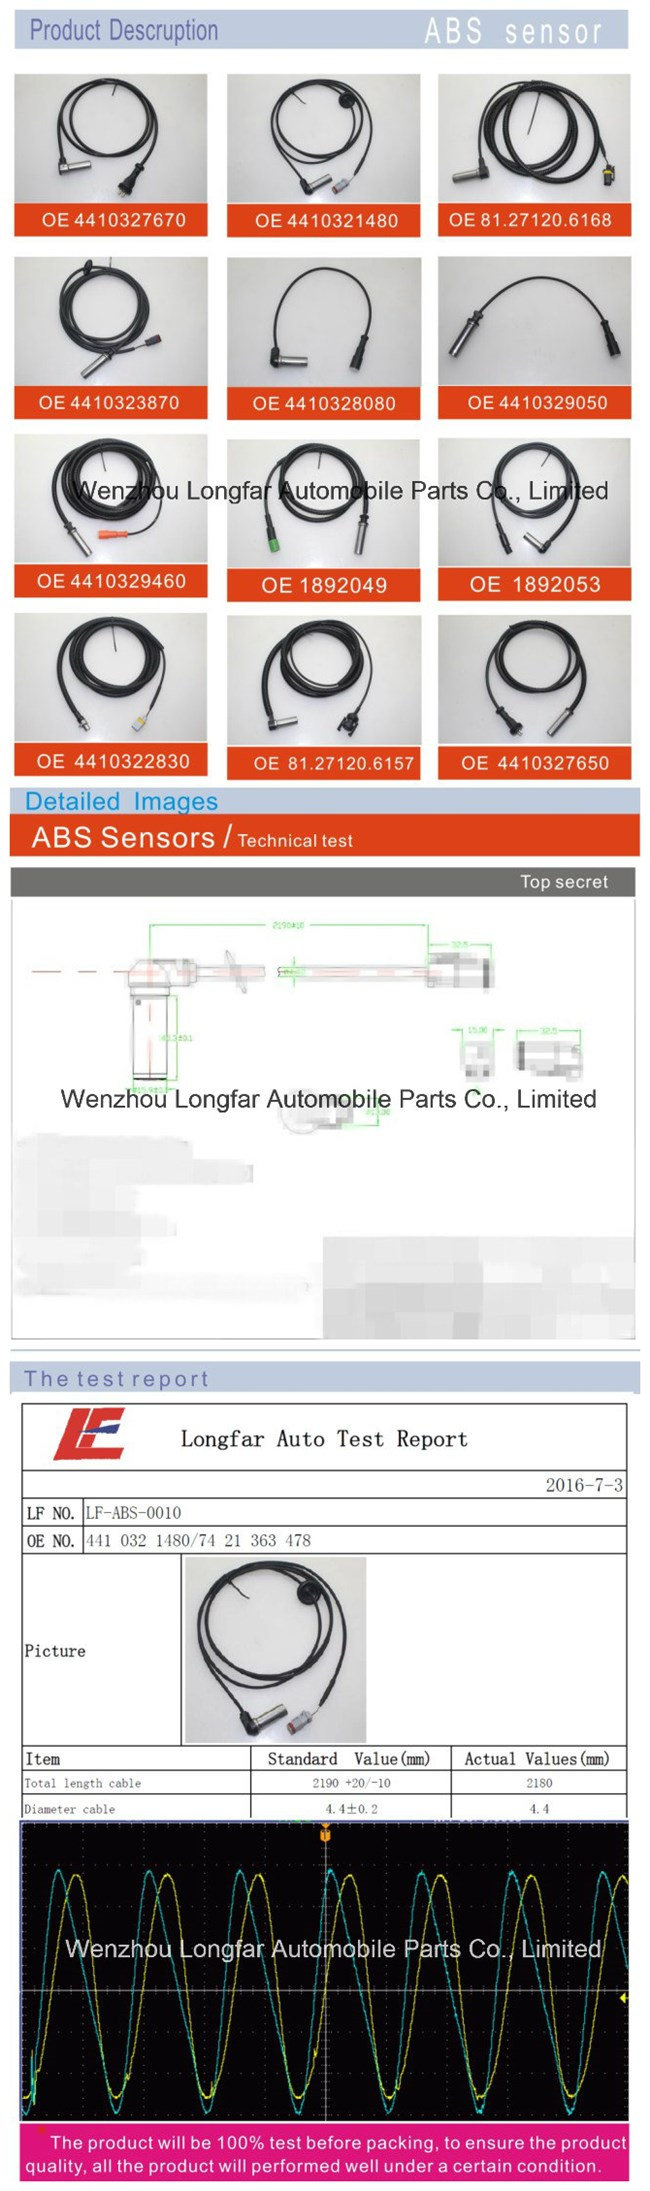 Auto Truck ABS Sensor Anti-Lock Braking System Transducer Indicator Sensor 1892054,1.21614,834 533 0012,041.307,85-50535-Sx,04.42.042 for Scania,Wabco,Dt,Meyle